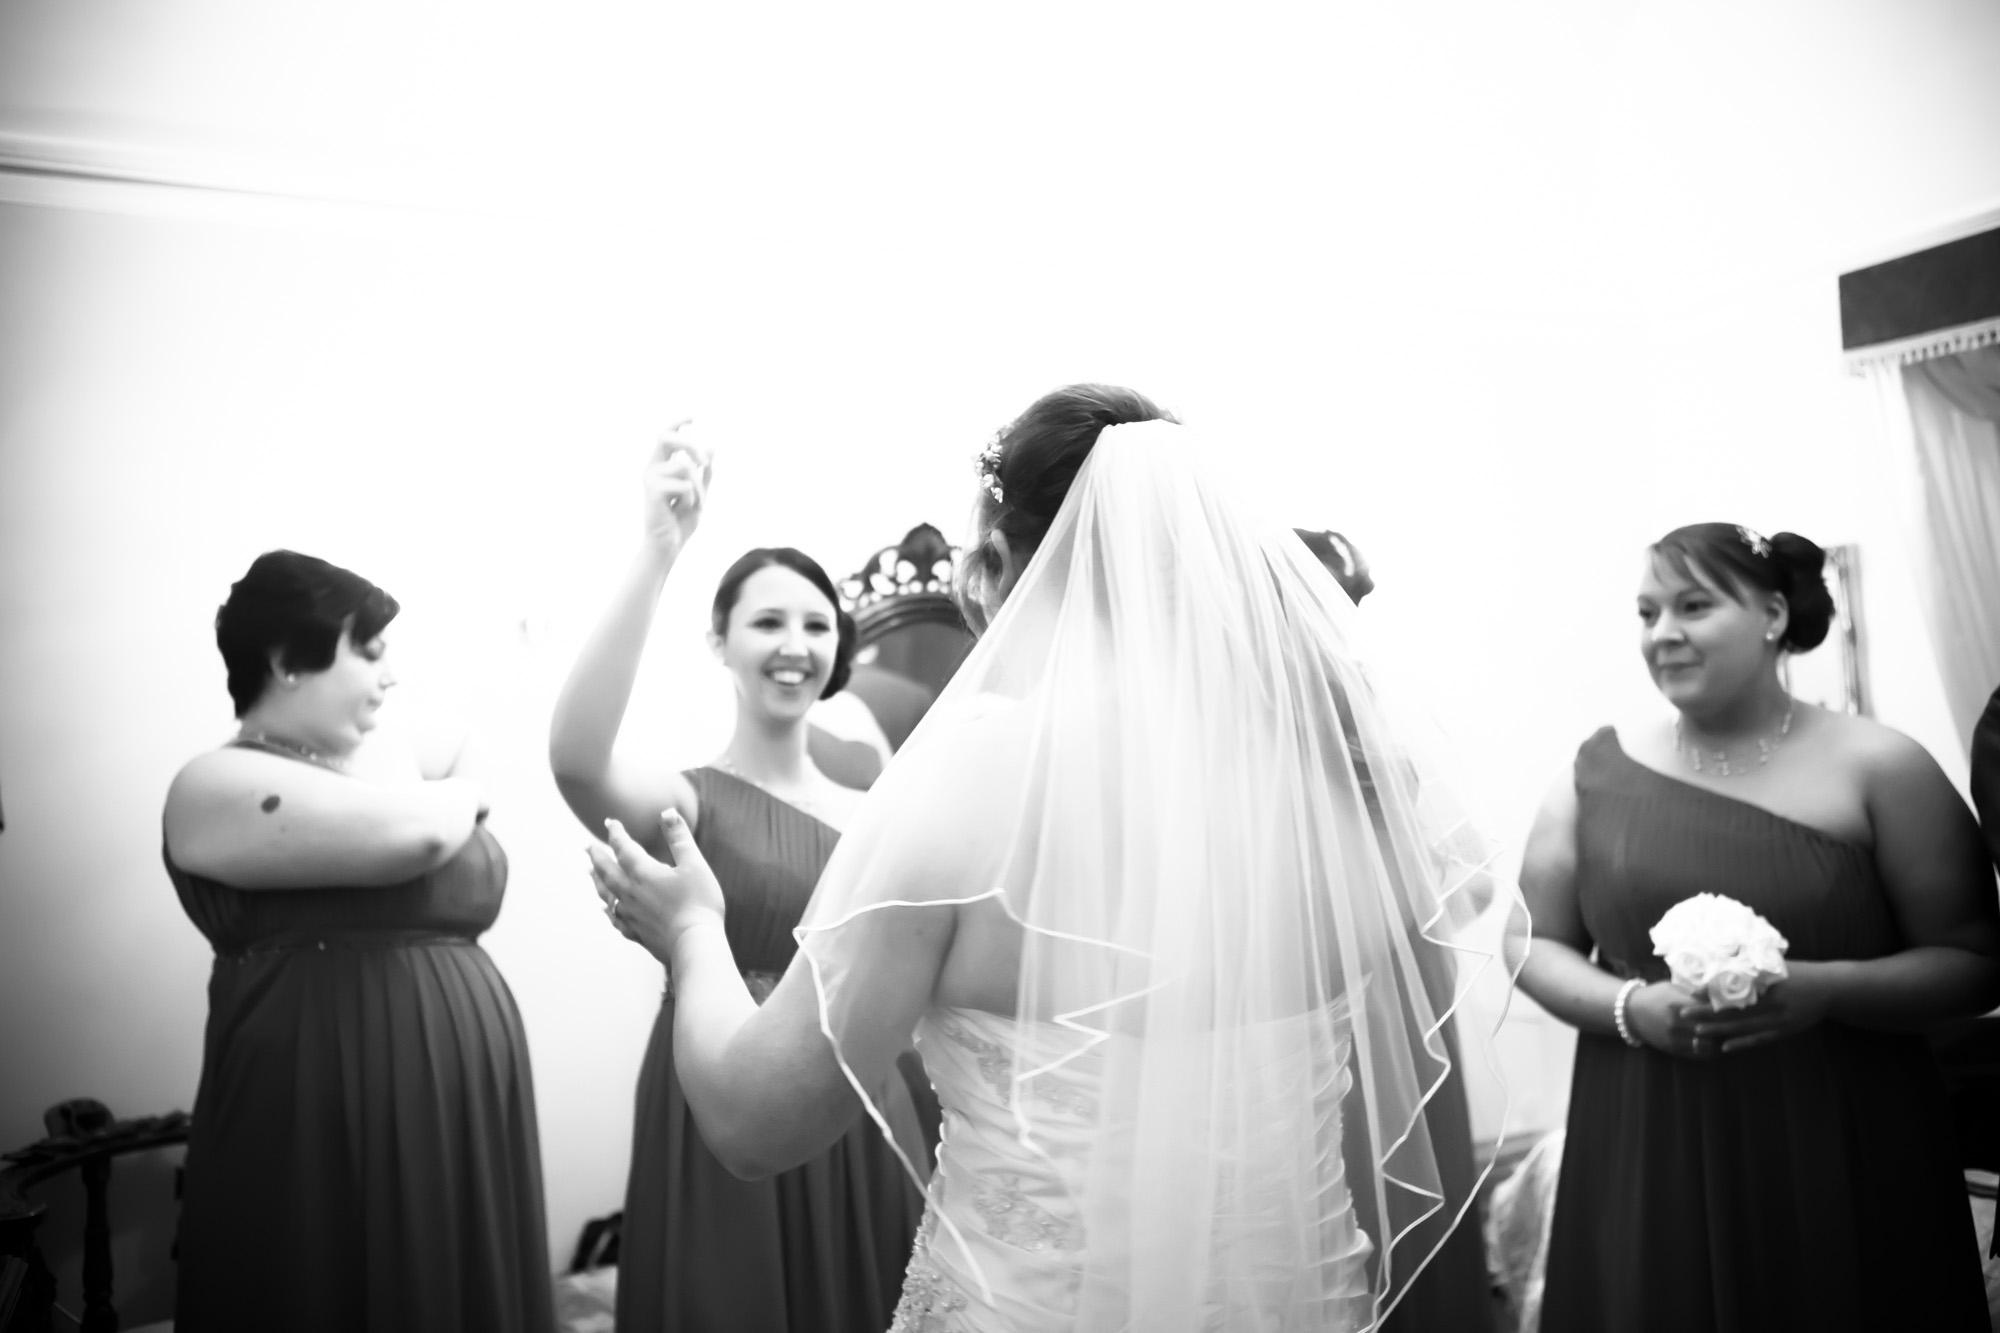 South Wales Wedding Photograher at Craig Y Nos Castle (9)